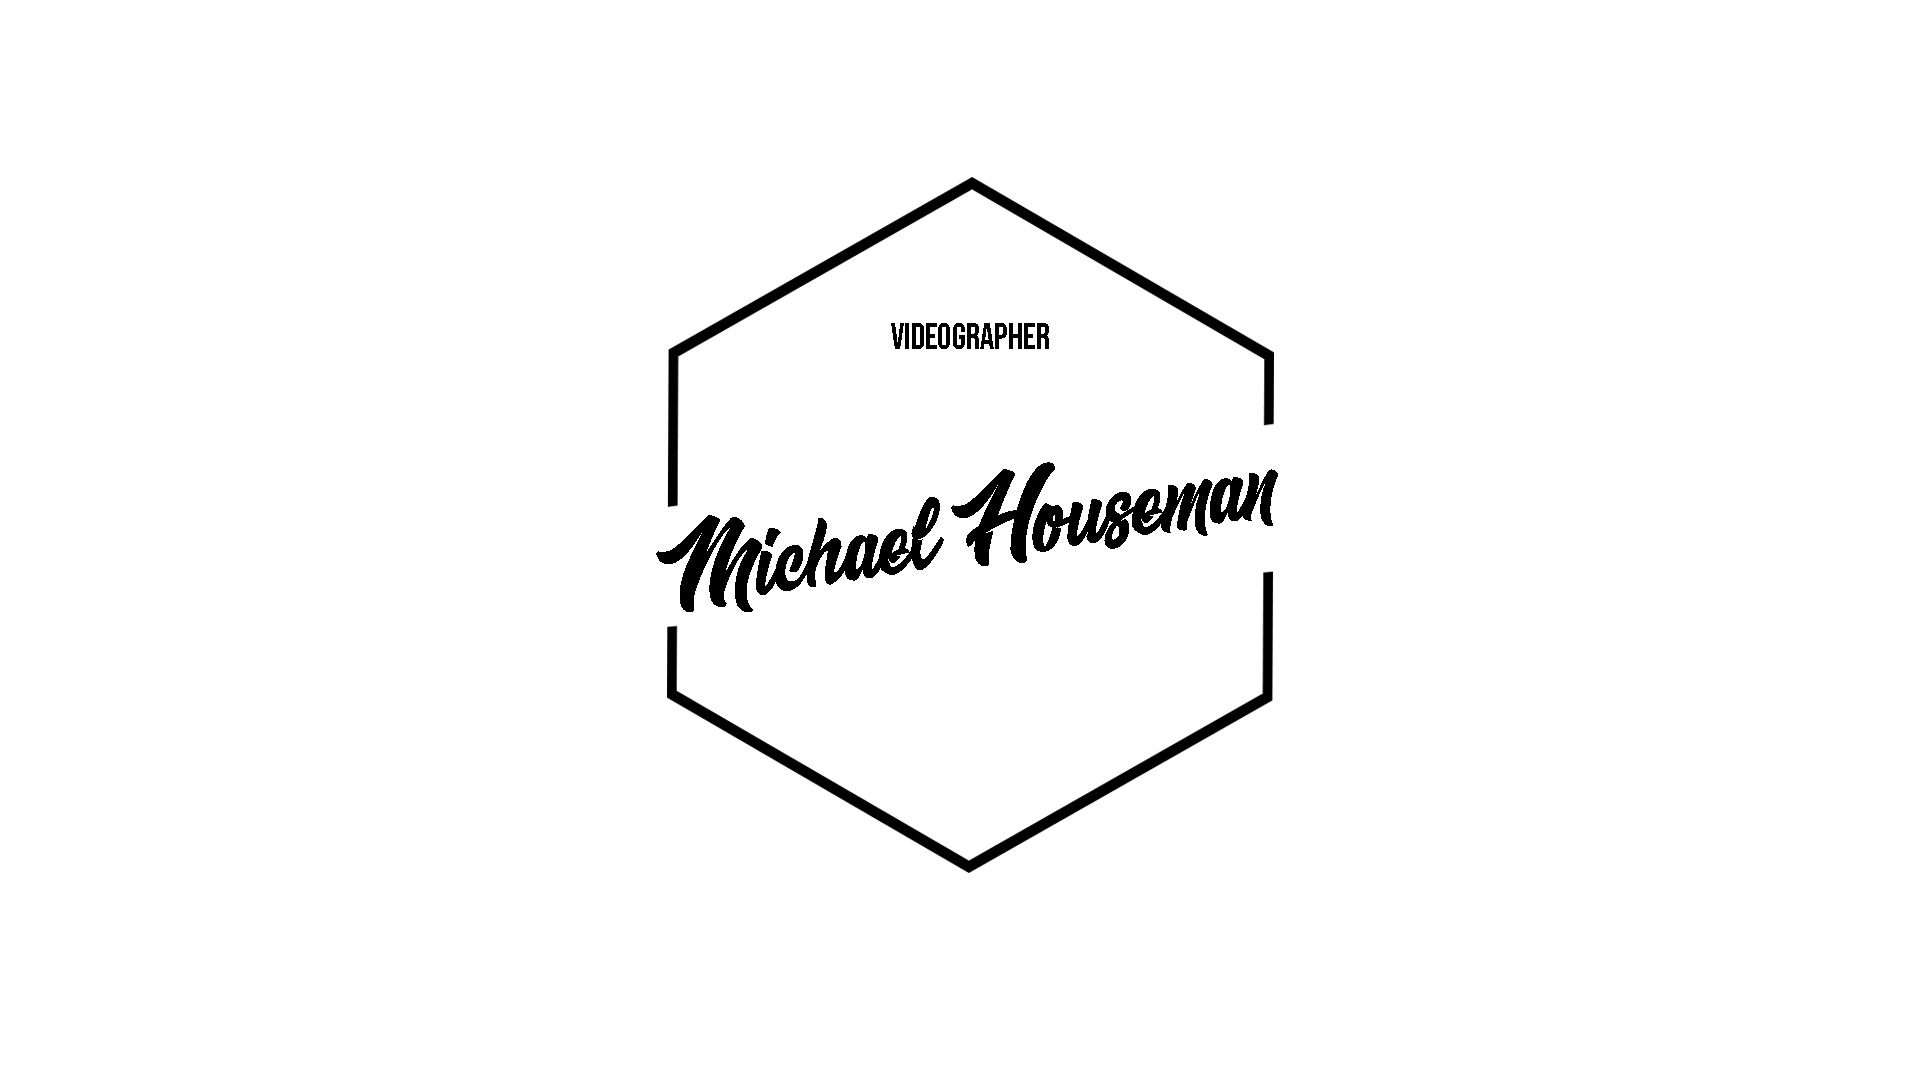 Michael Houseman Videography